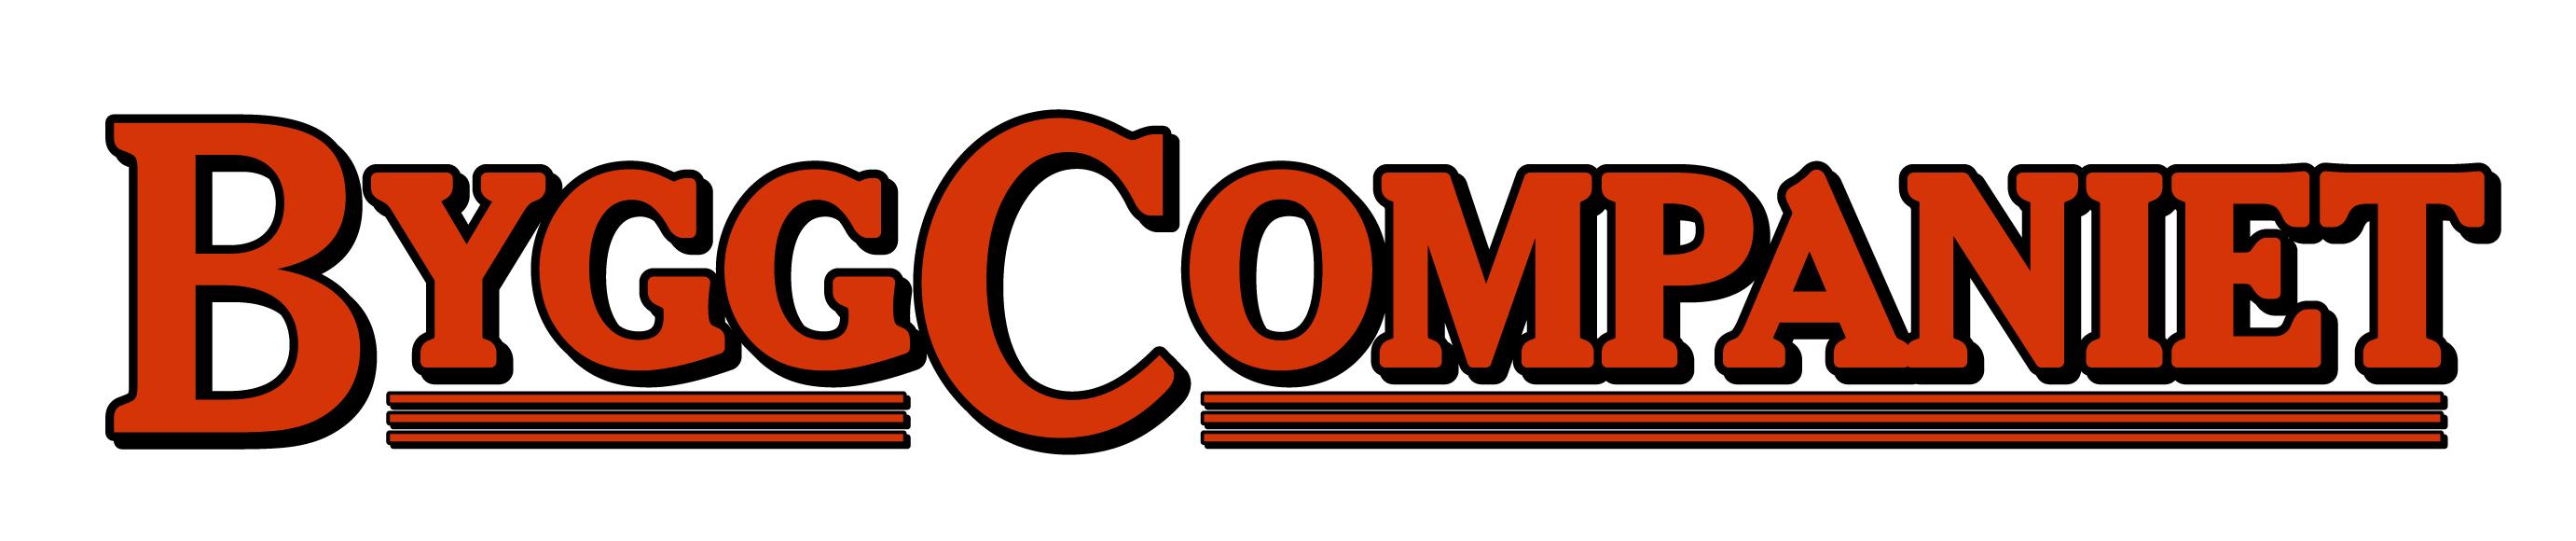 logotyp ByggCompaniet